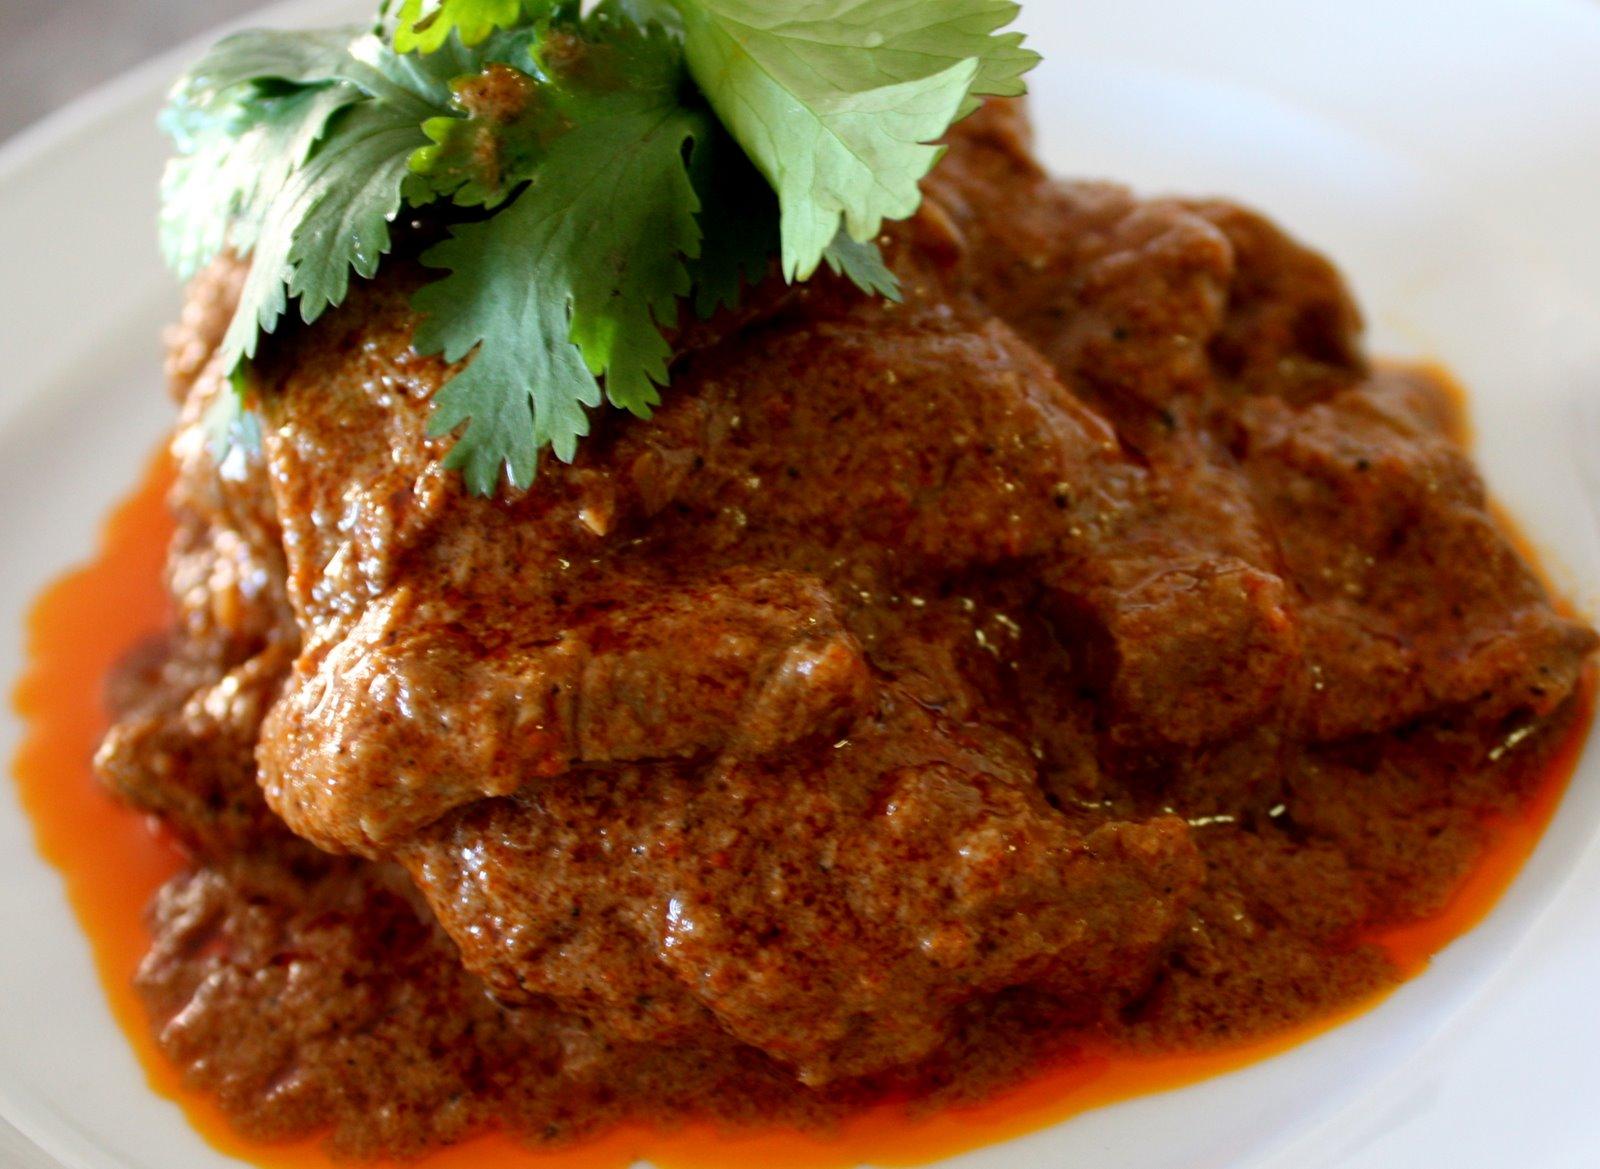 EAT: BEEF RENDANG